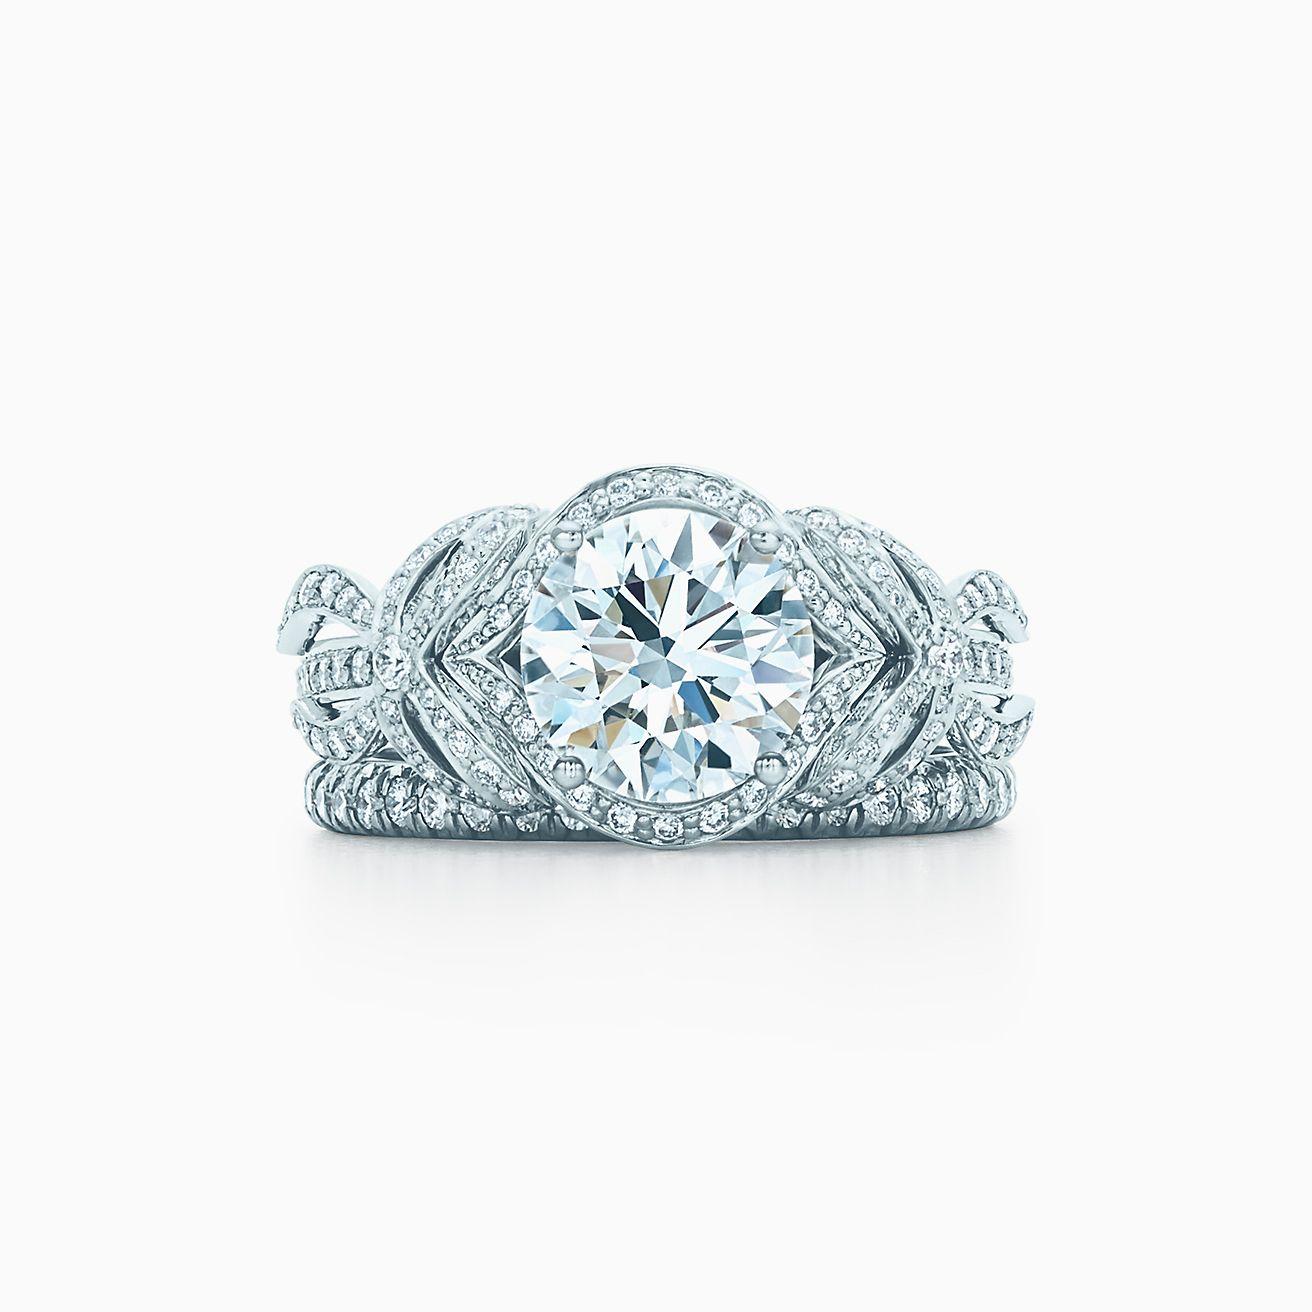 65778890cb25c Tiffany Bow Ribbon Engagement Ring in Platinum